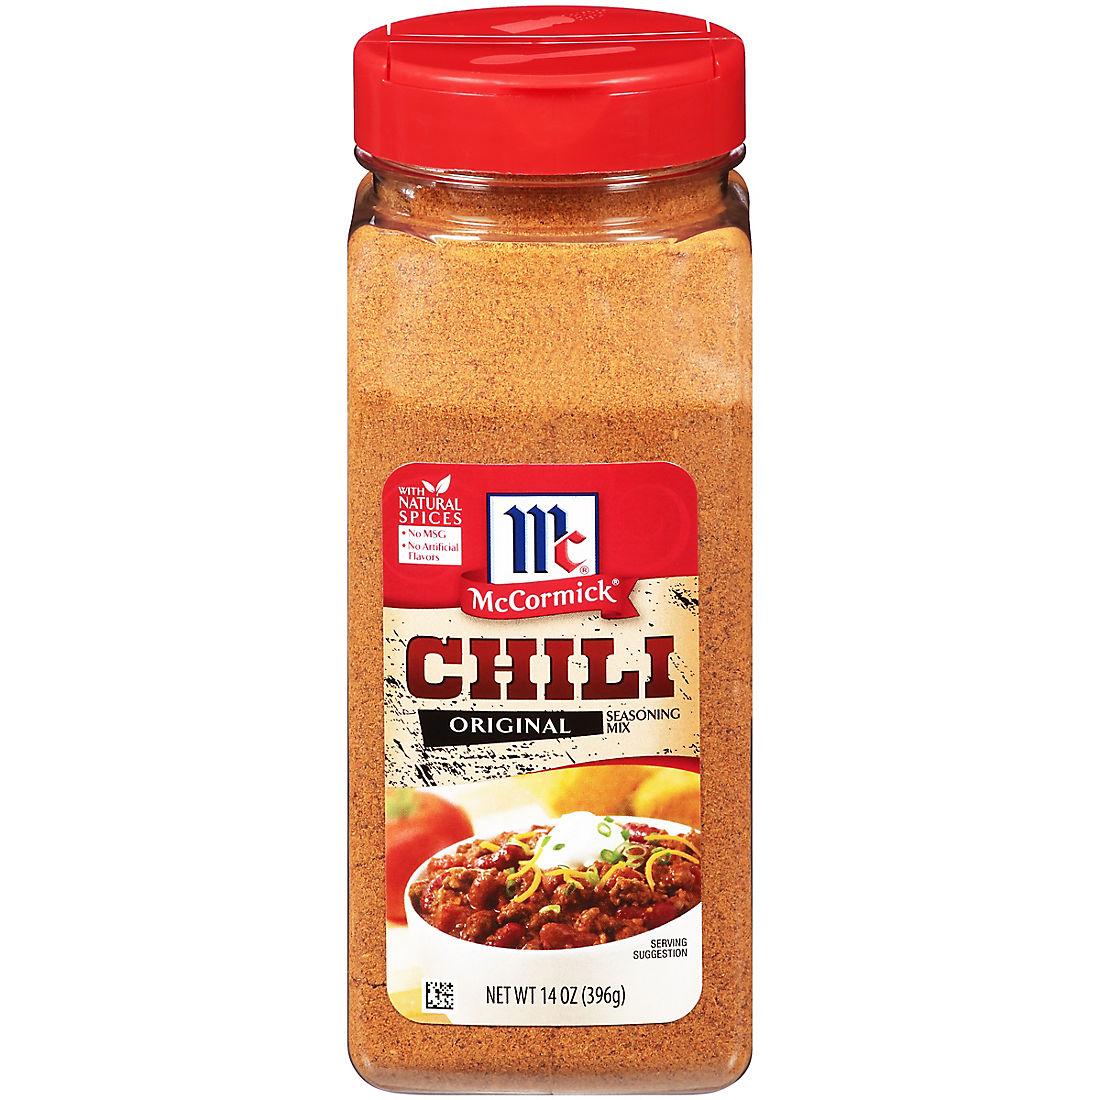 McCormick Chili Original Seasoning Mix, 14 oz